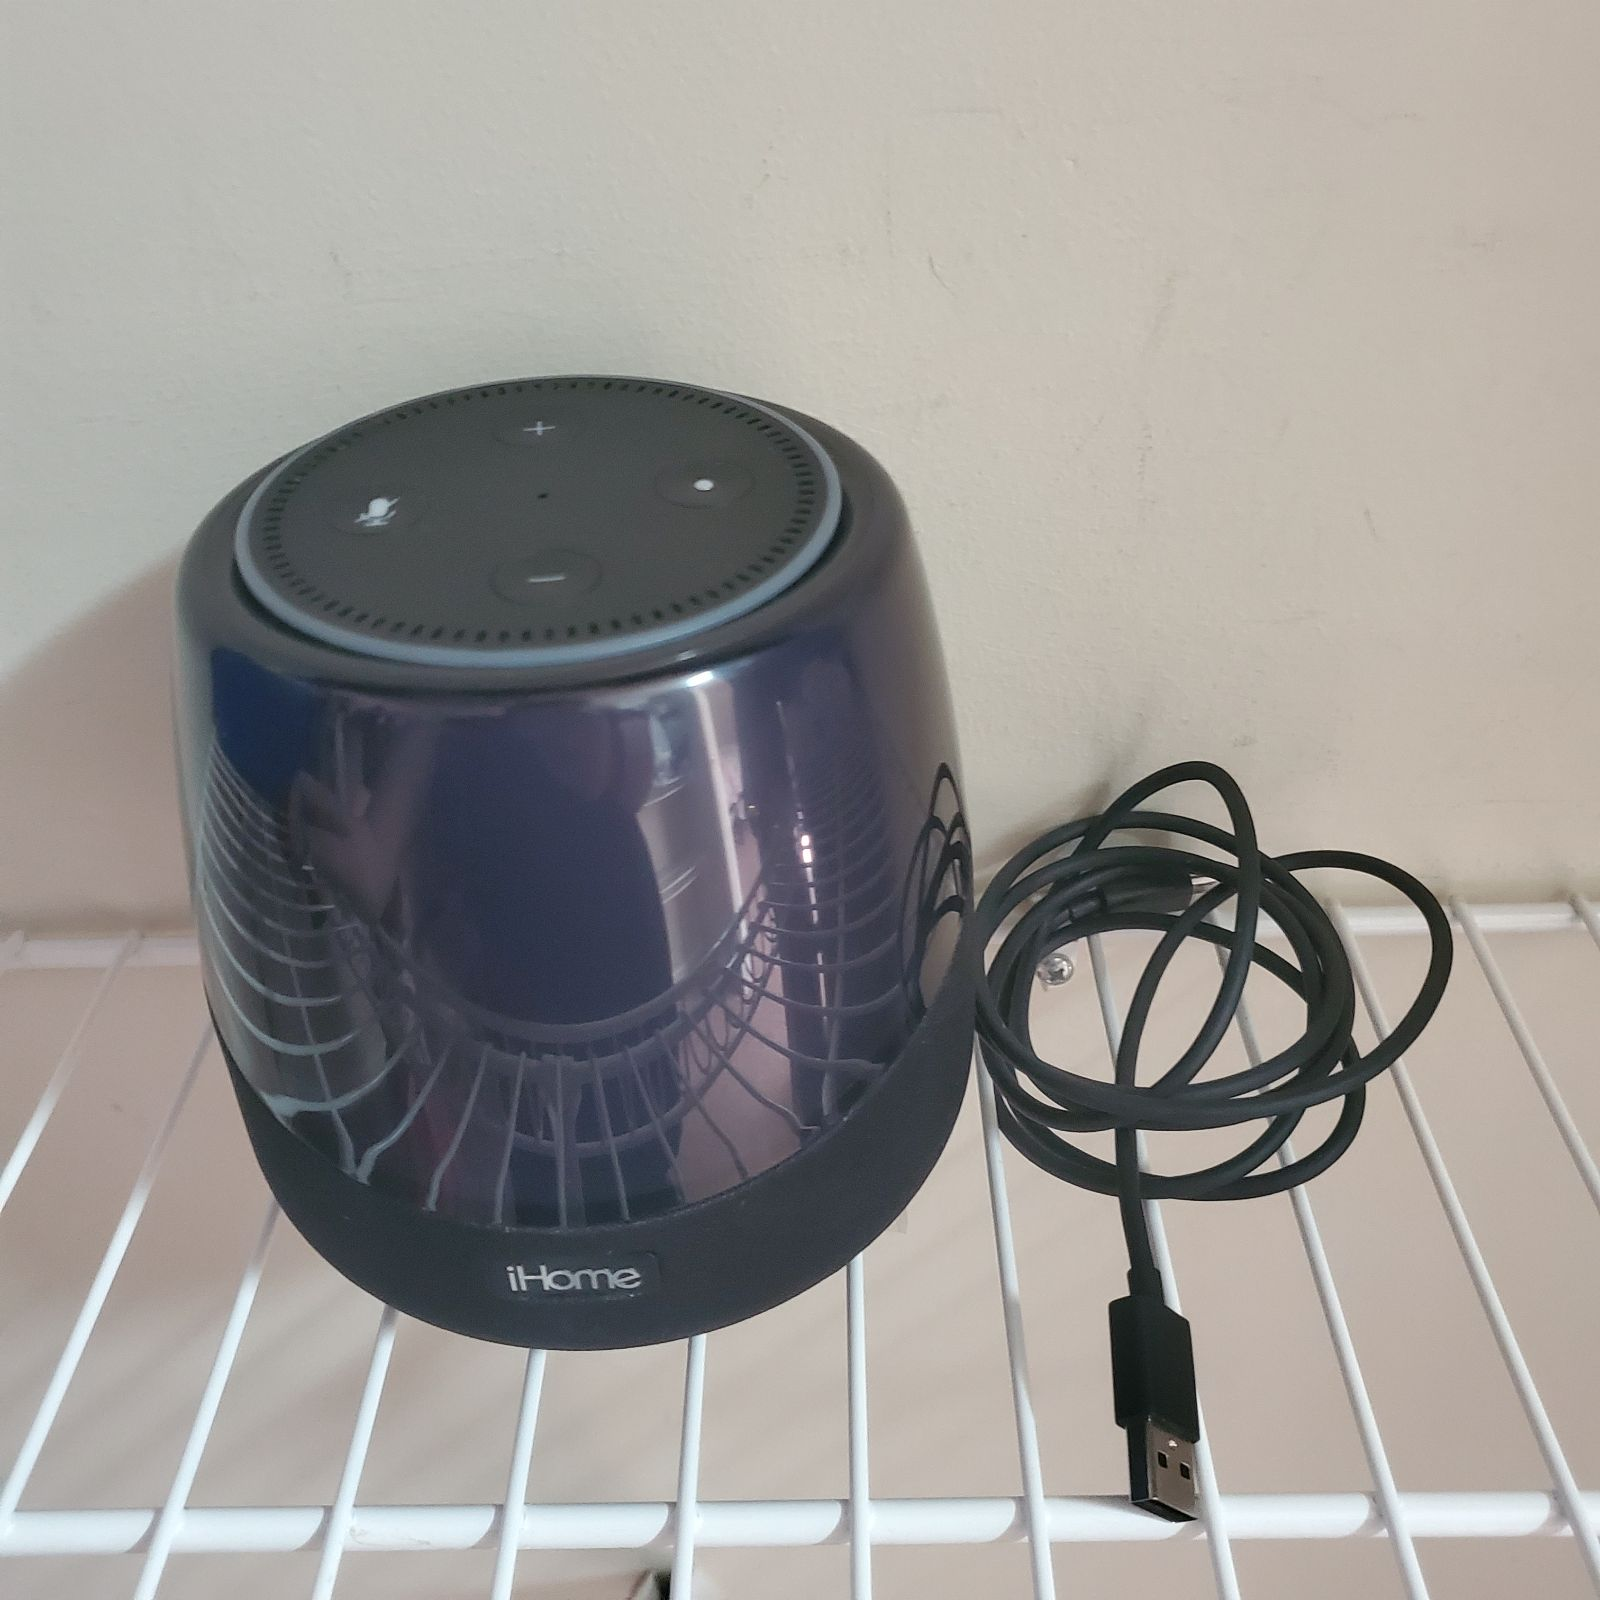 IHome Bluetooth Speaker with Amazon Ech